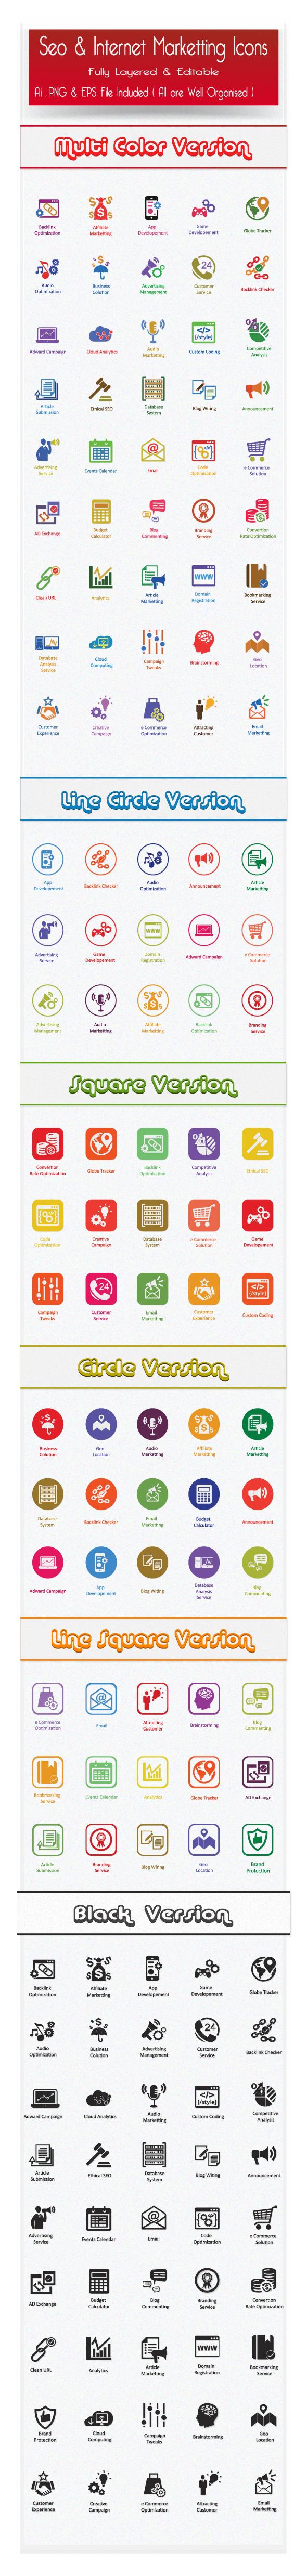 Flat SEO Icons and Internet Marketing Icons